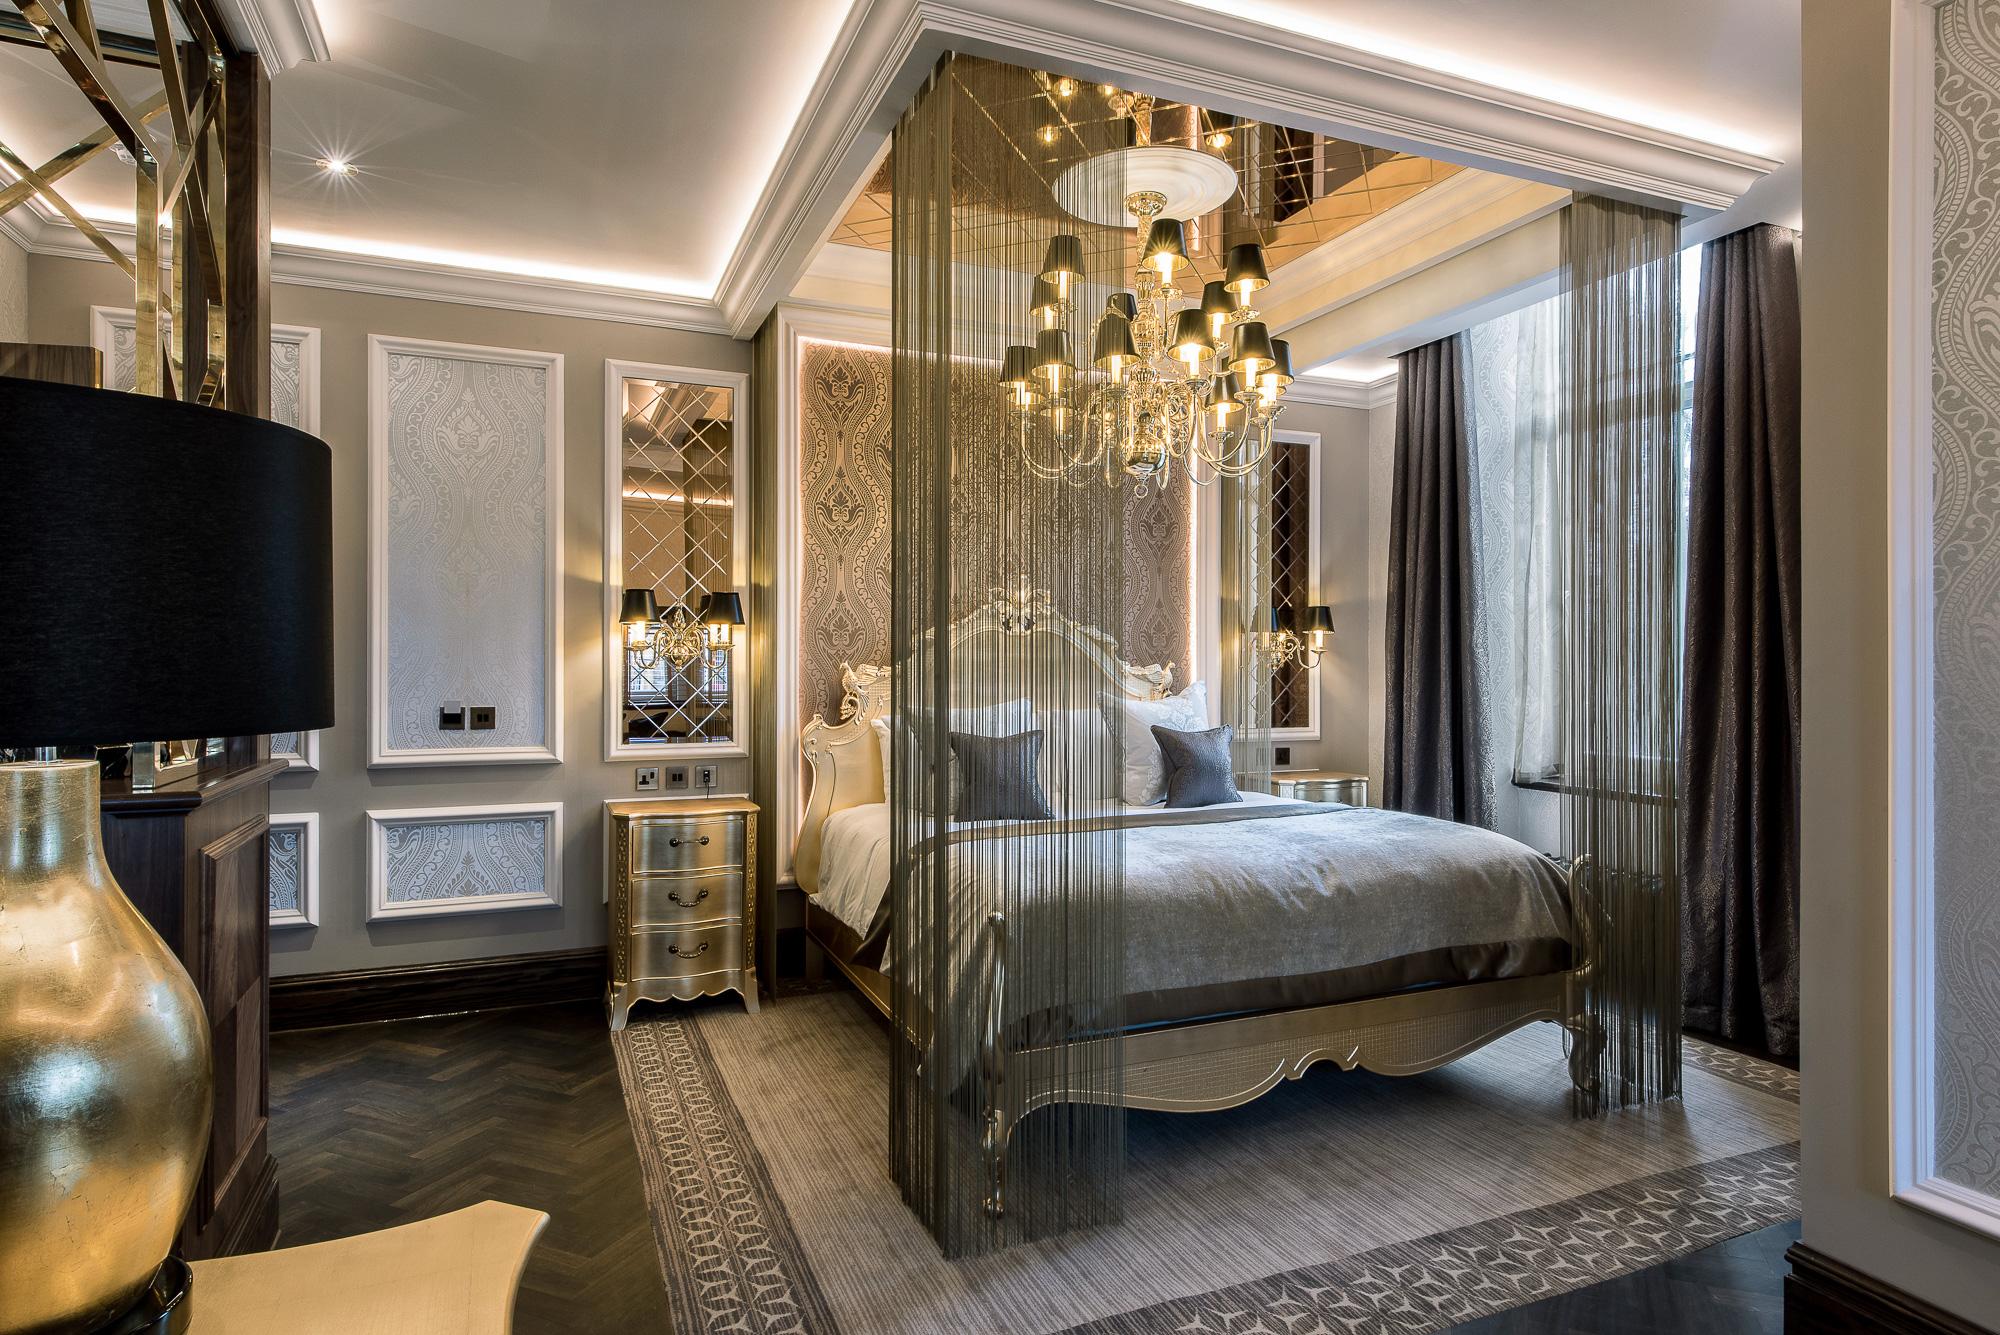 hotel-honeymoon-bedroom.jpg